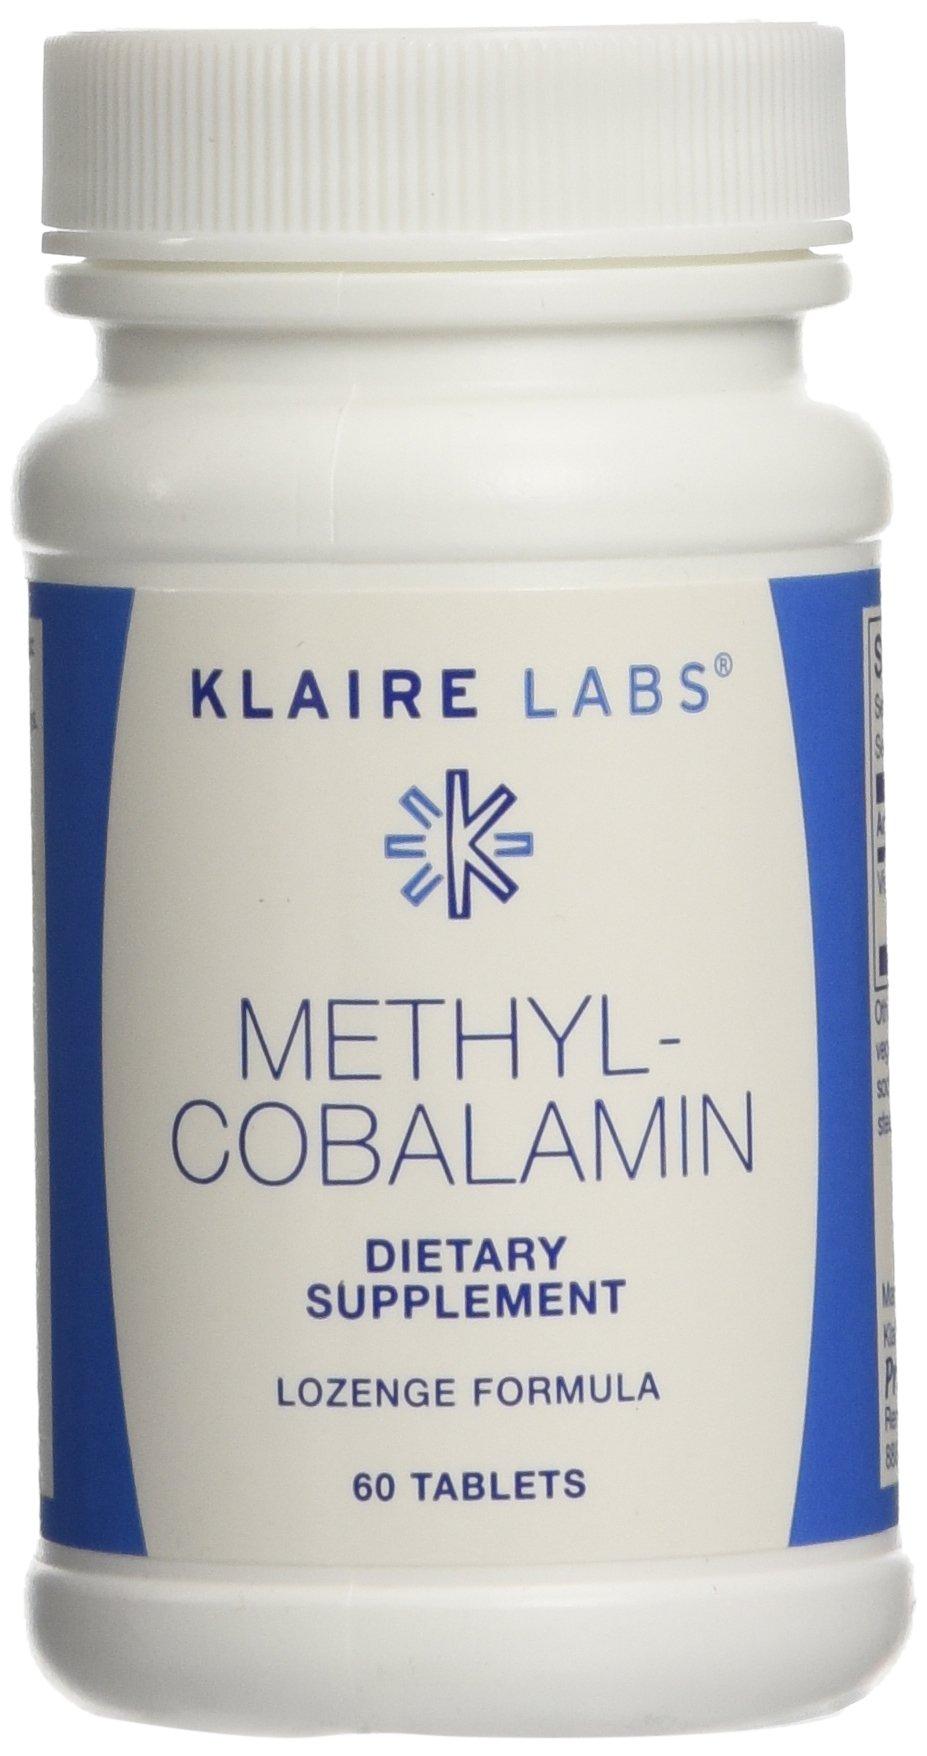 Klaire Labs - Methylcobalamin (sublingual) 60t